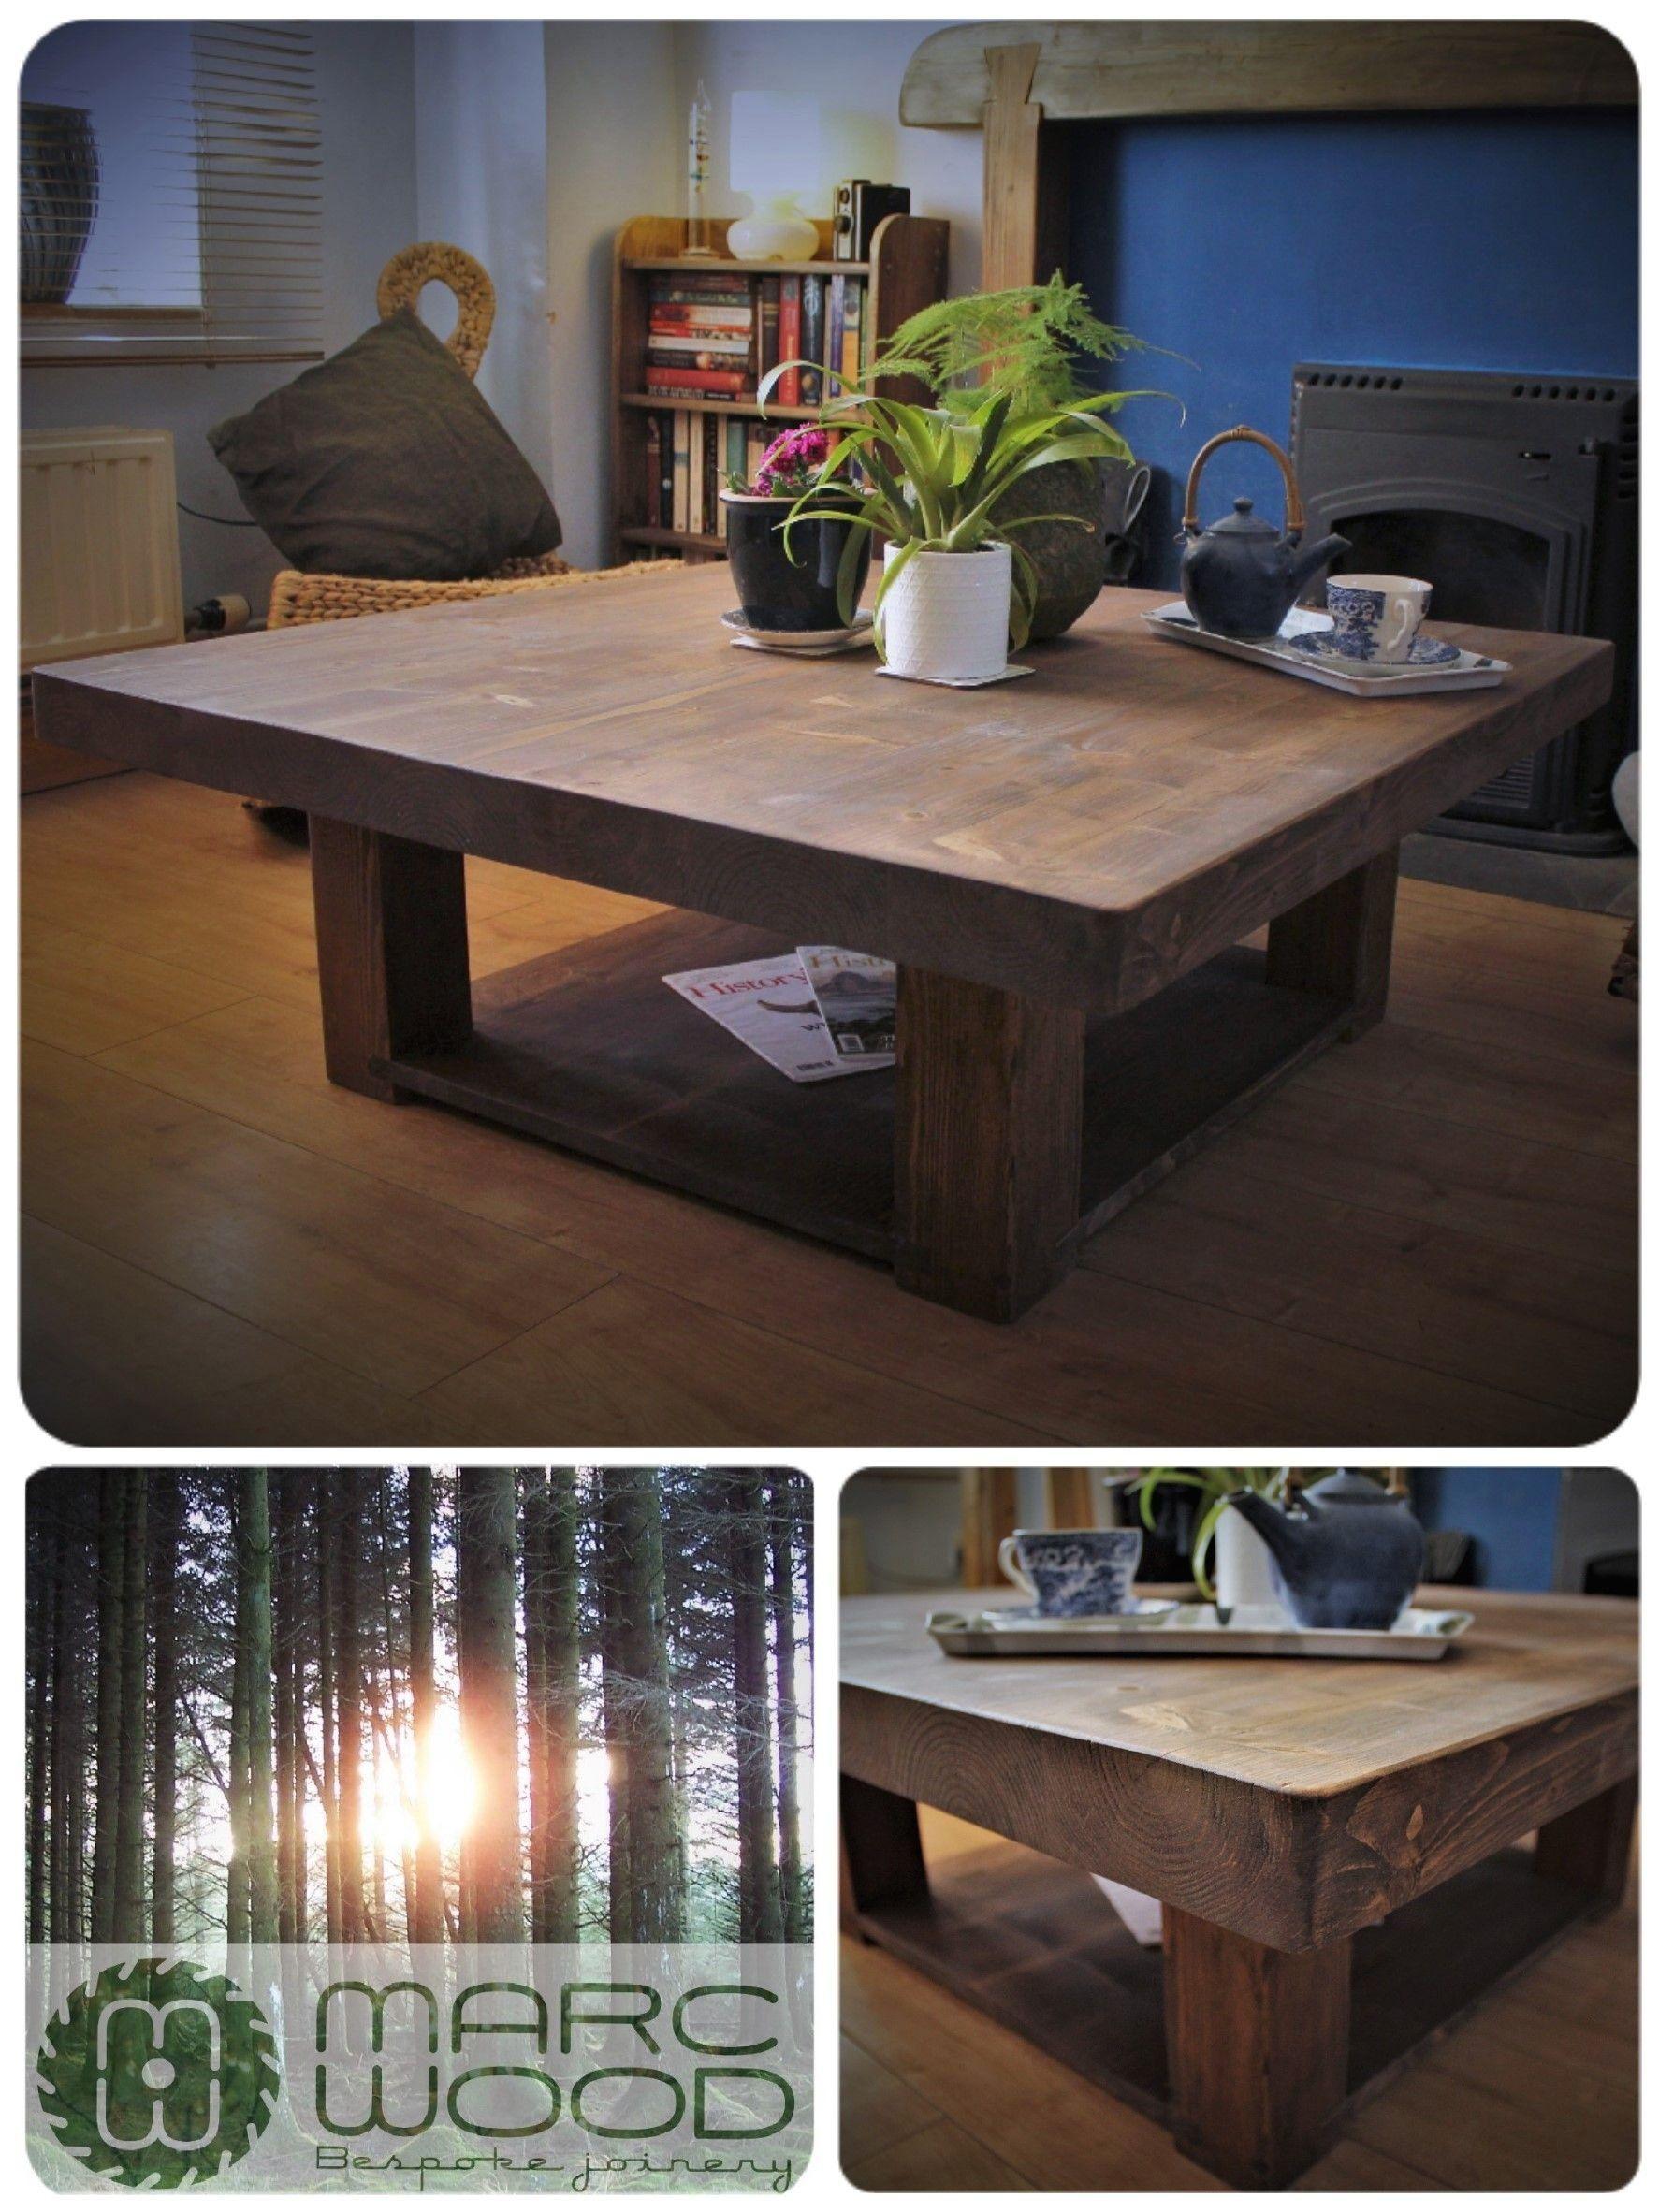 Handmade 100 X 100 Cm Square Slab Top Coffee Table In Reclaimed Wood Our Custom 1000 Coffee Table Farmhouse Square Wooden Coffee Table Coffee Table